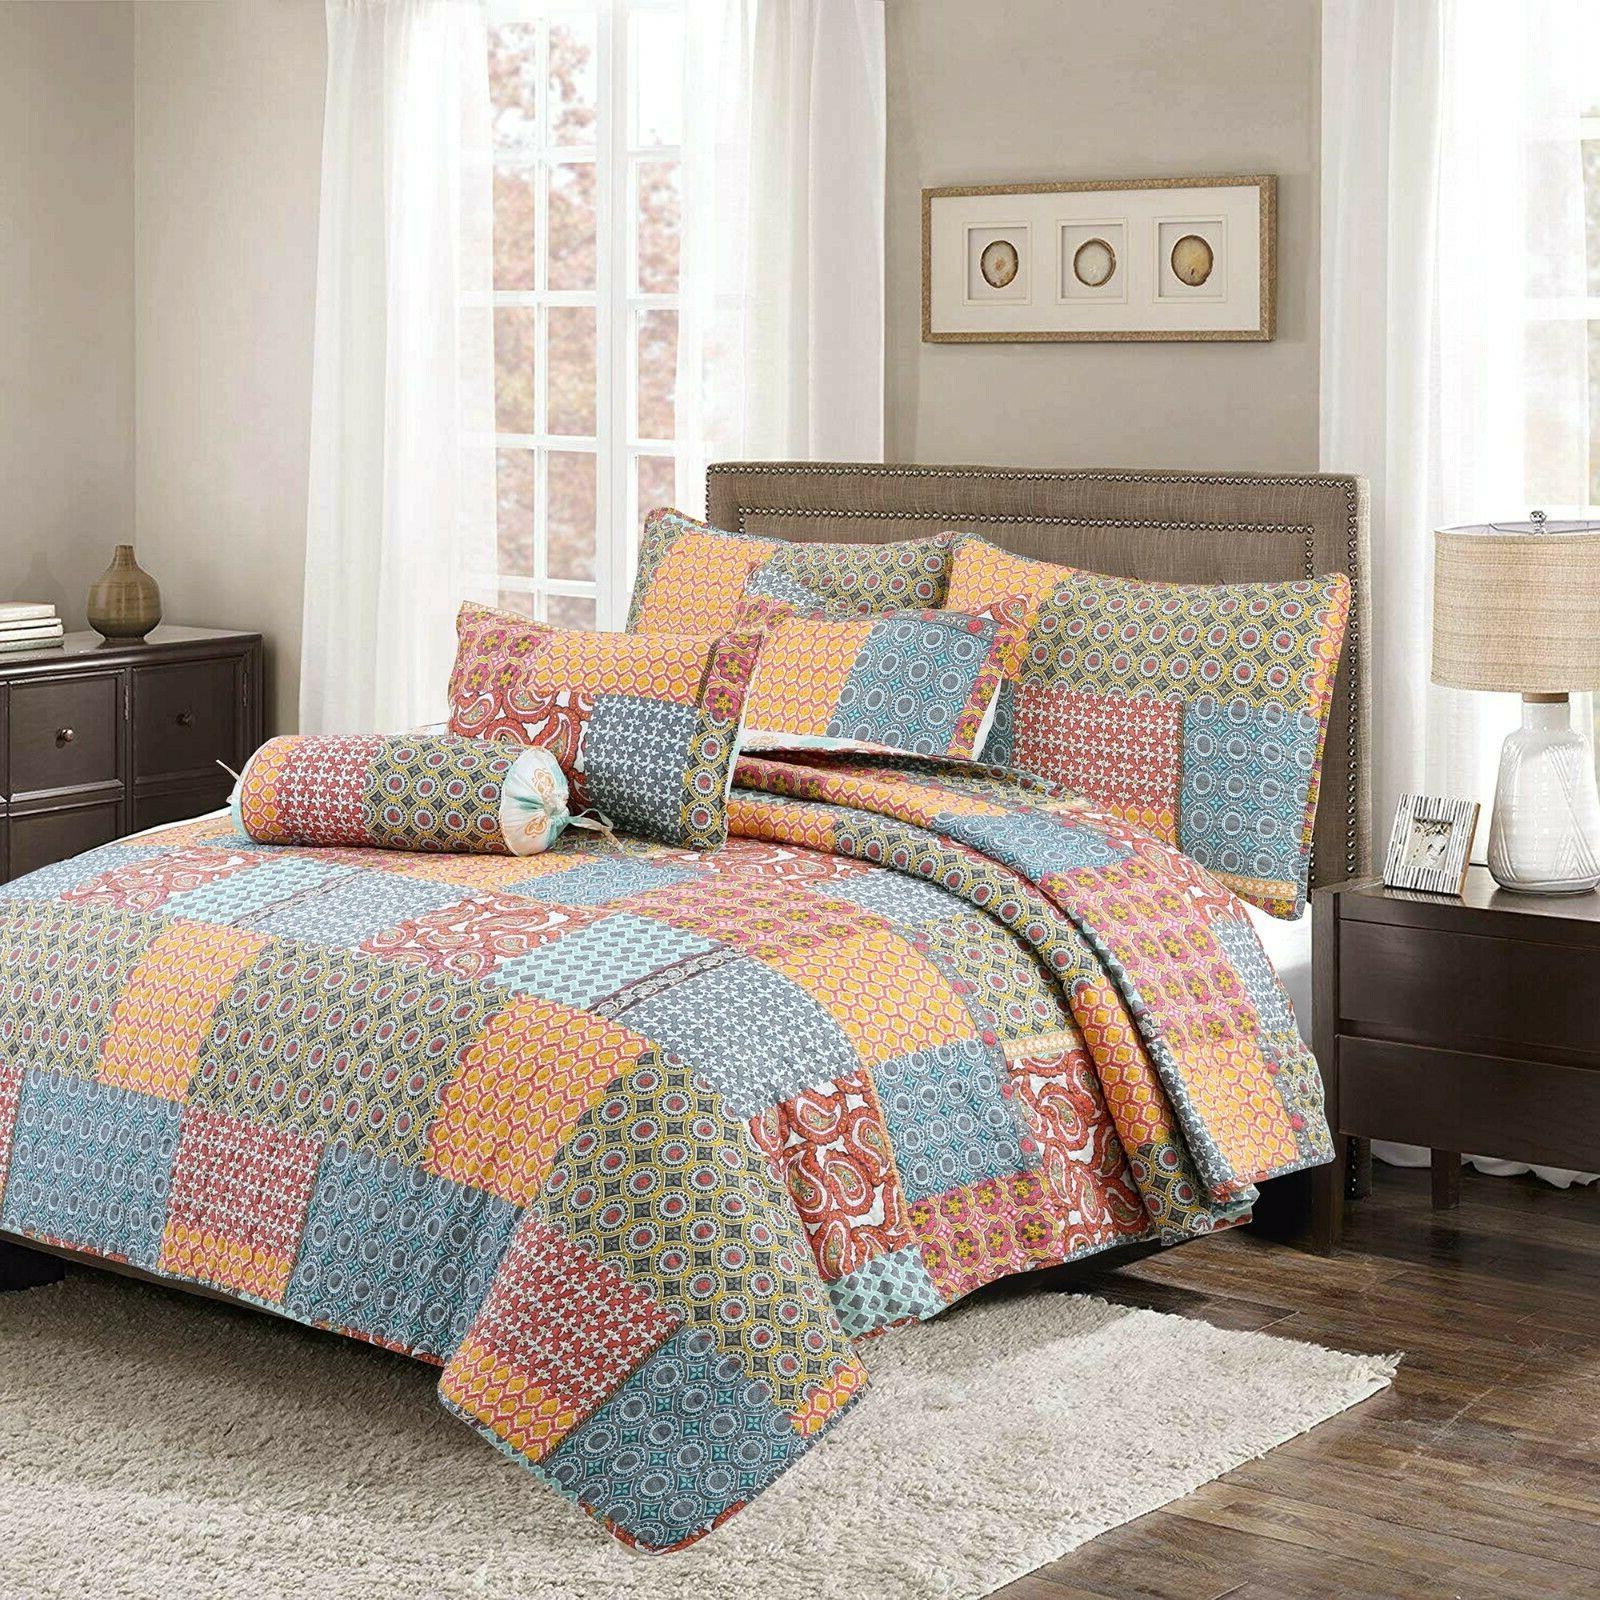 Antique 3-Piece Quilt Bedspread,